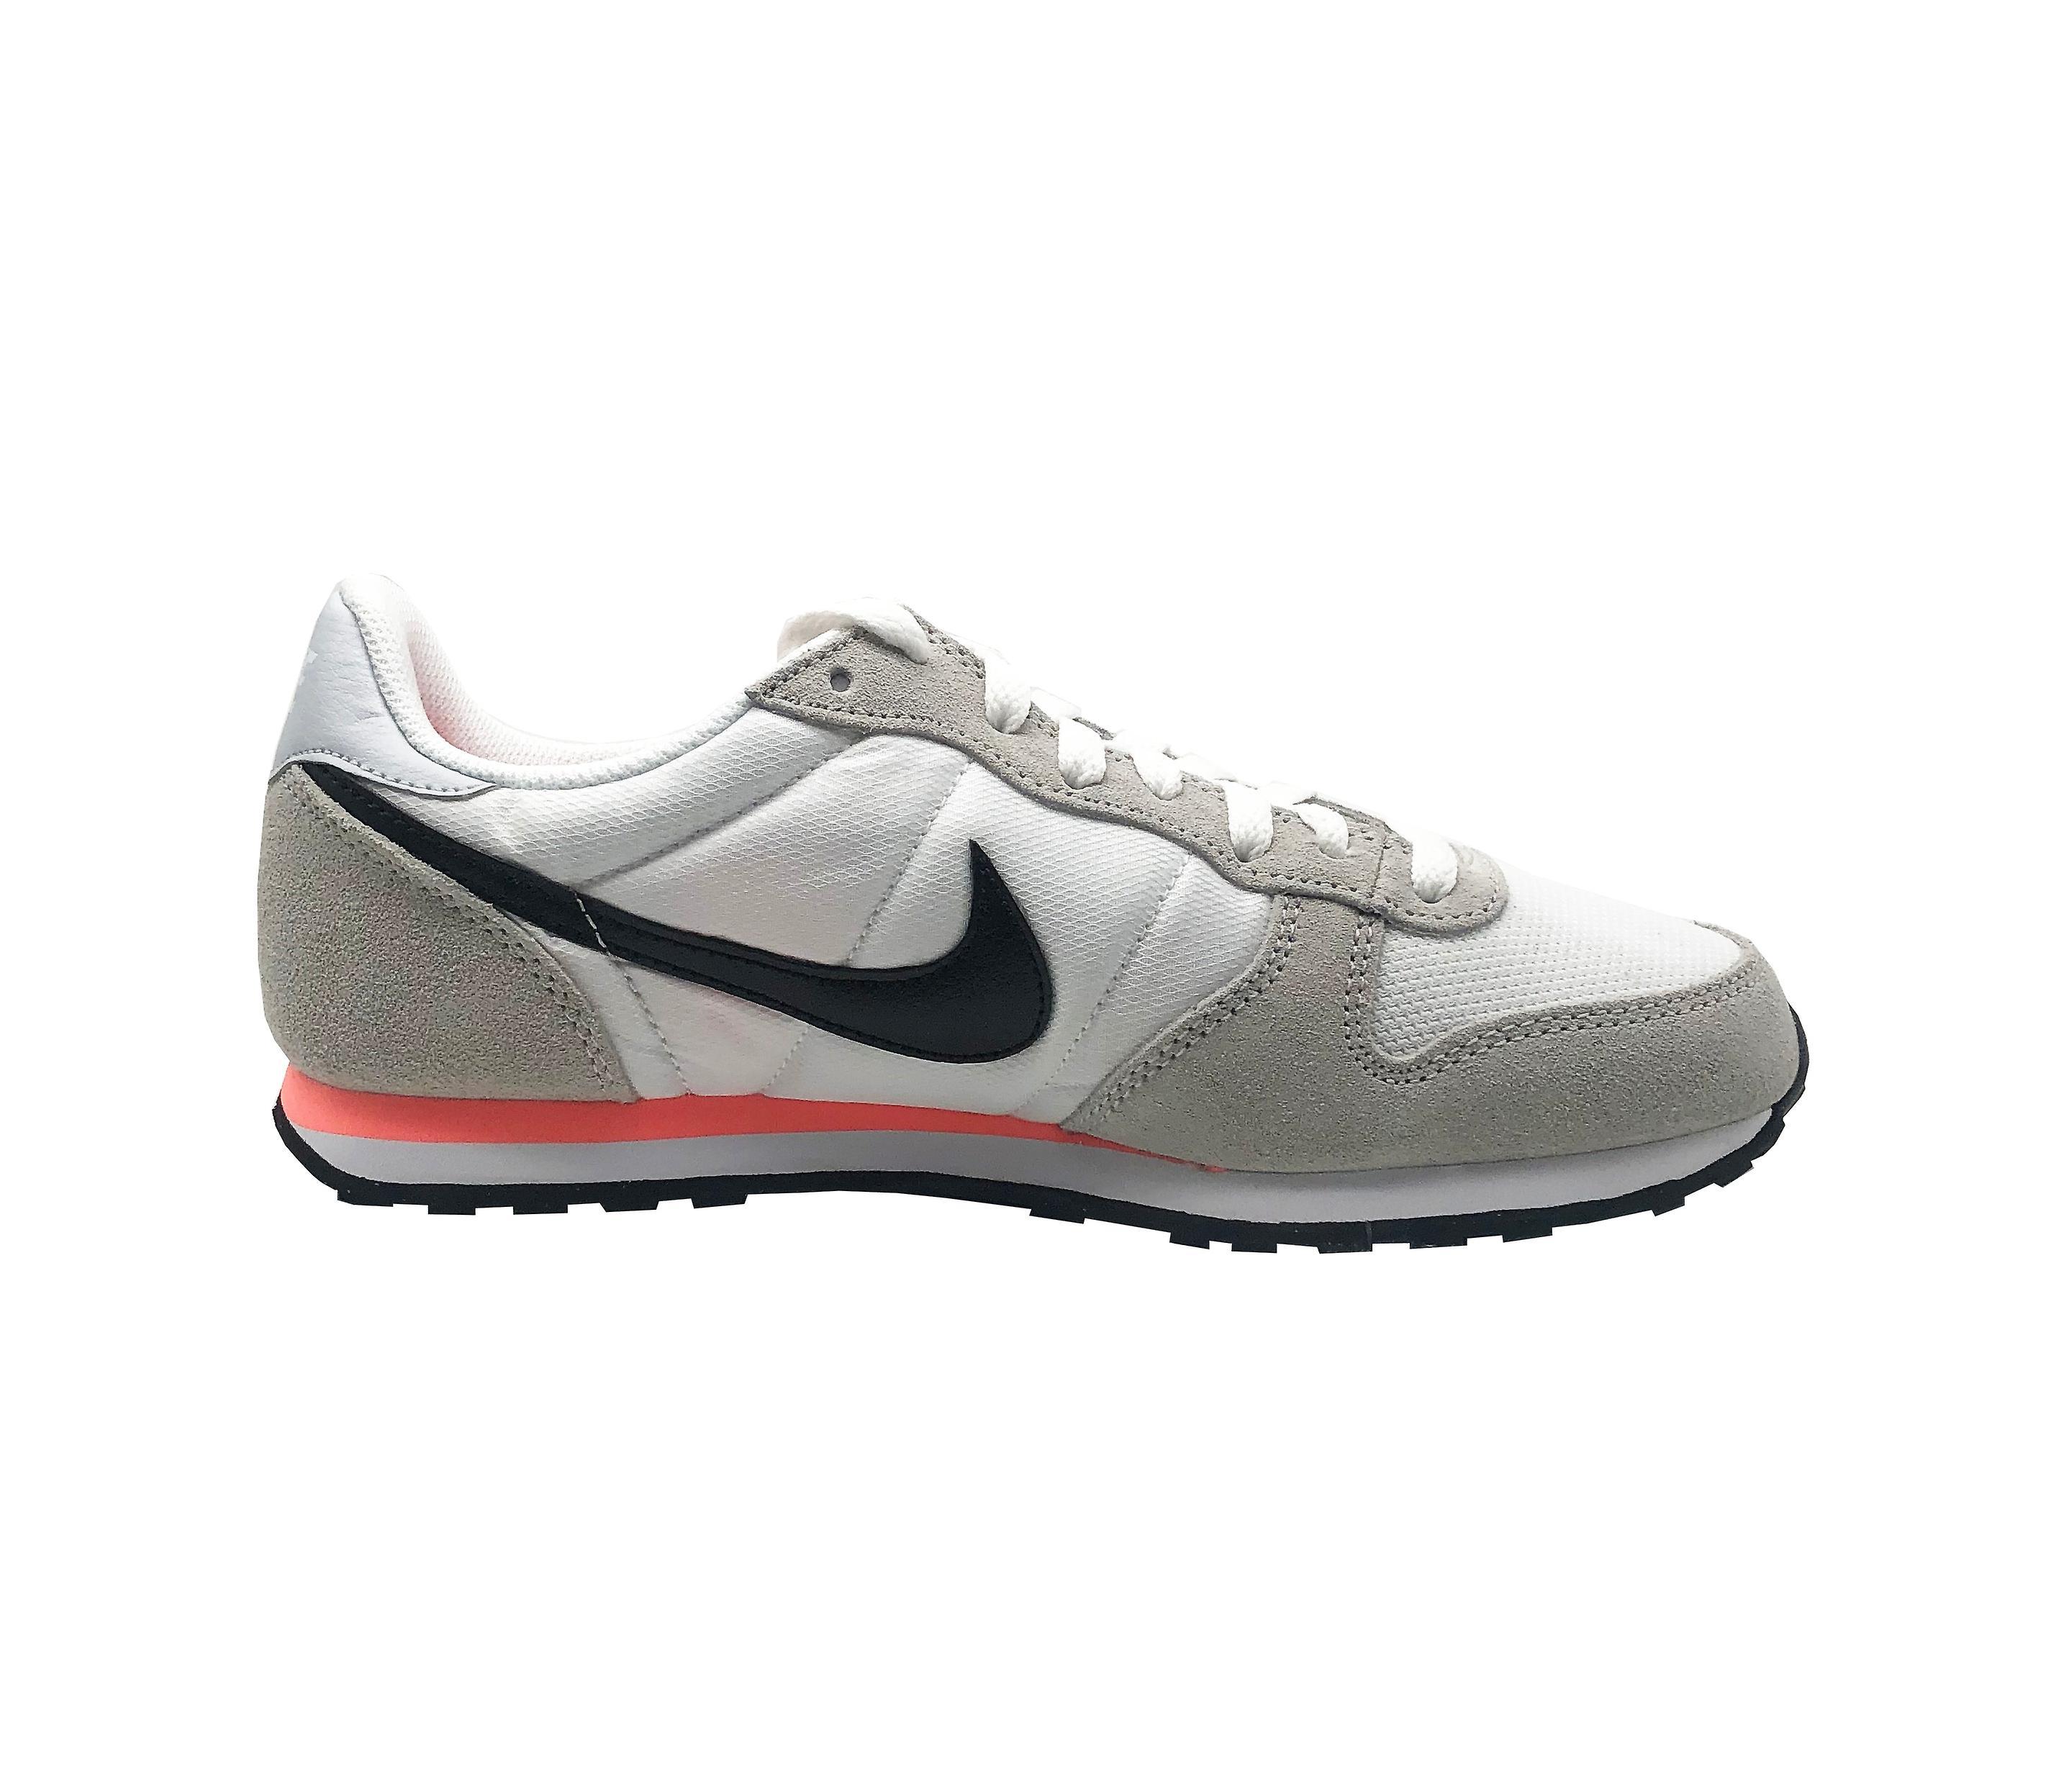 Nike Genicco 644451 101 Womens utbildare